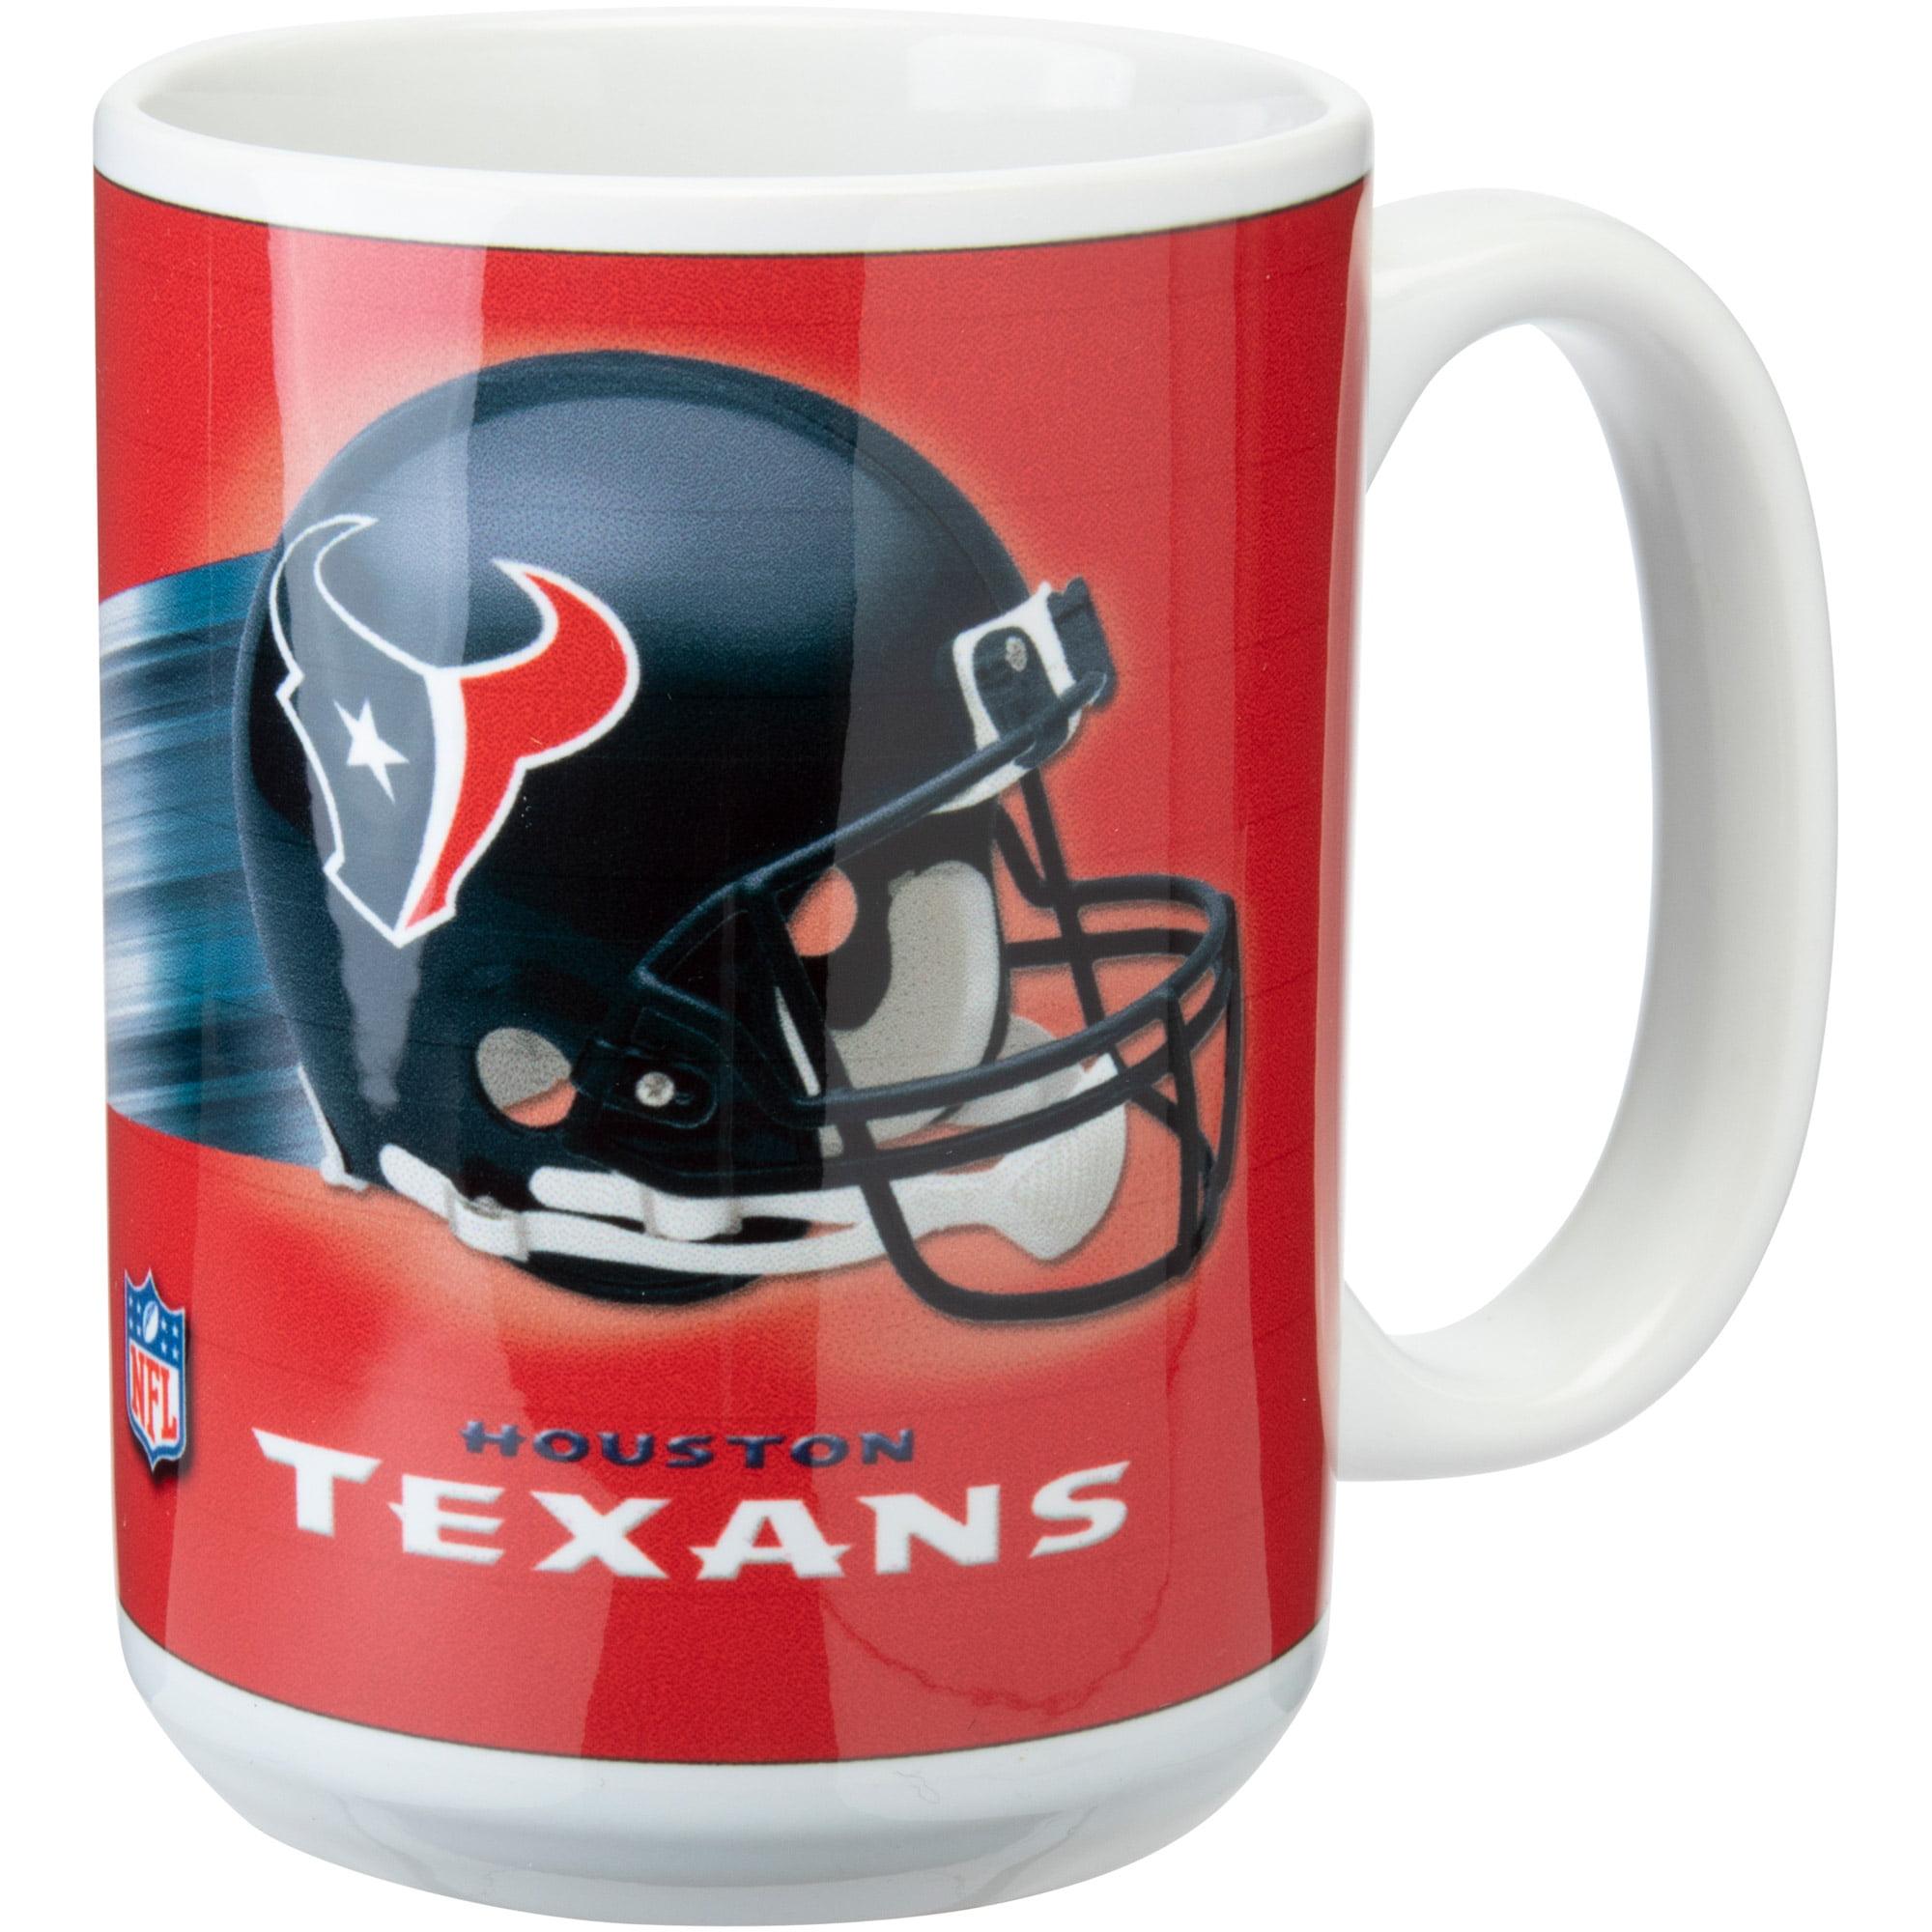 Houston Texans 15oz. Team 3D Graphic Mug - No Size